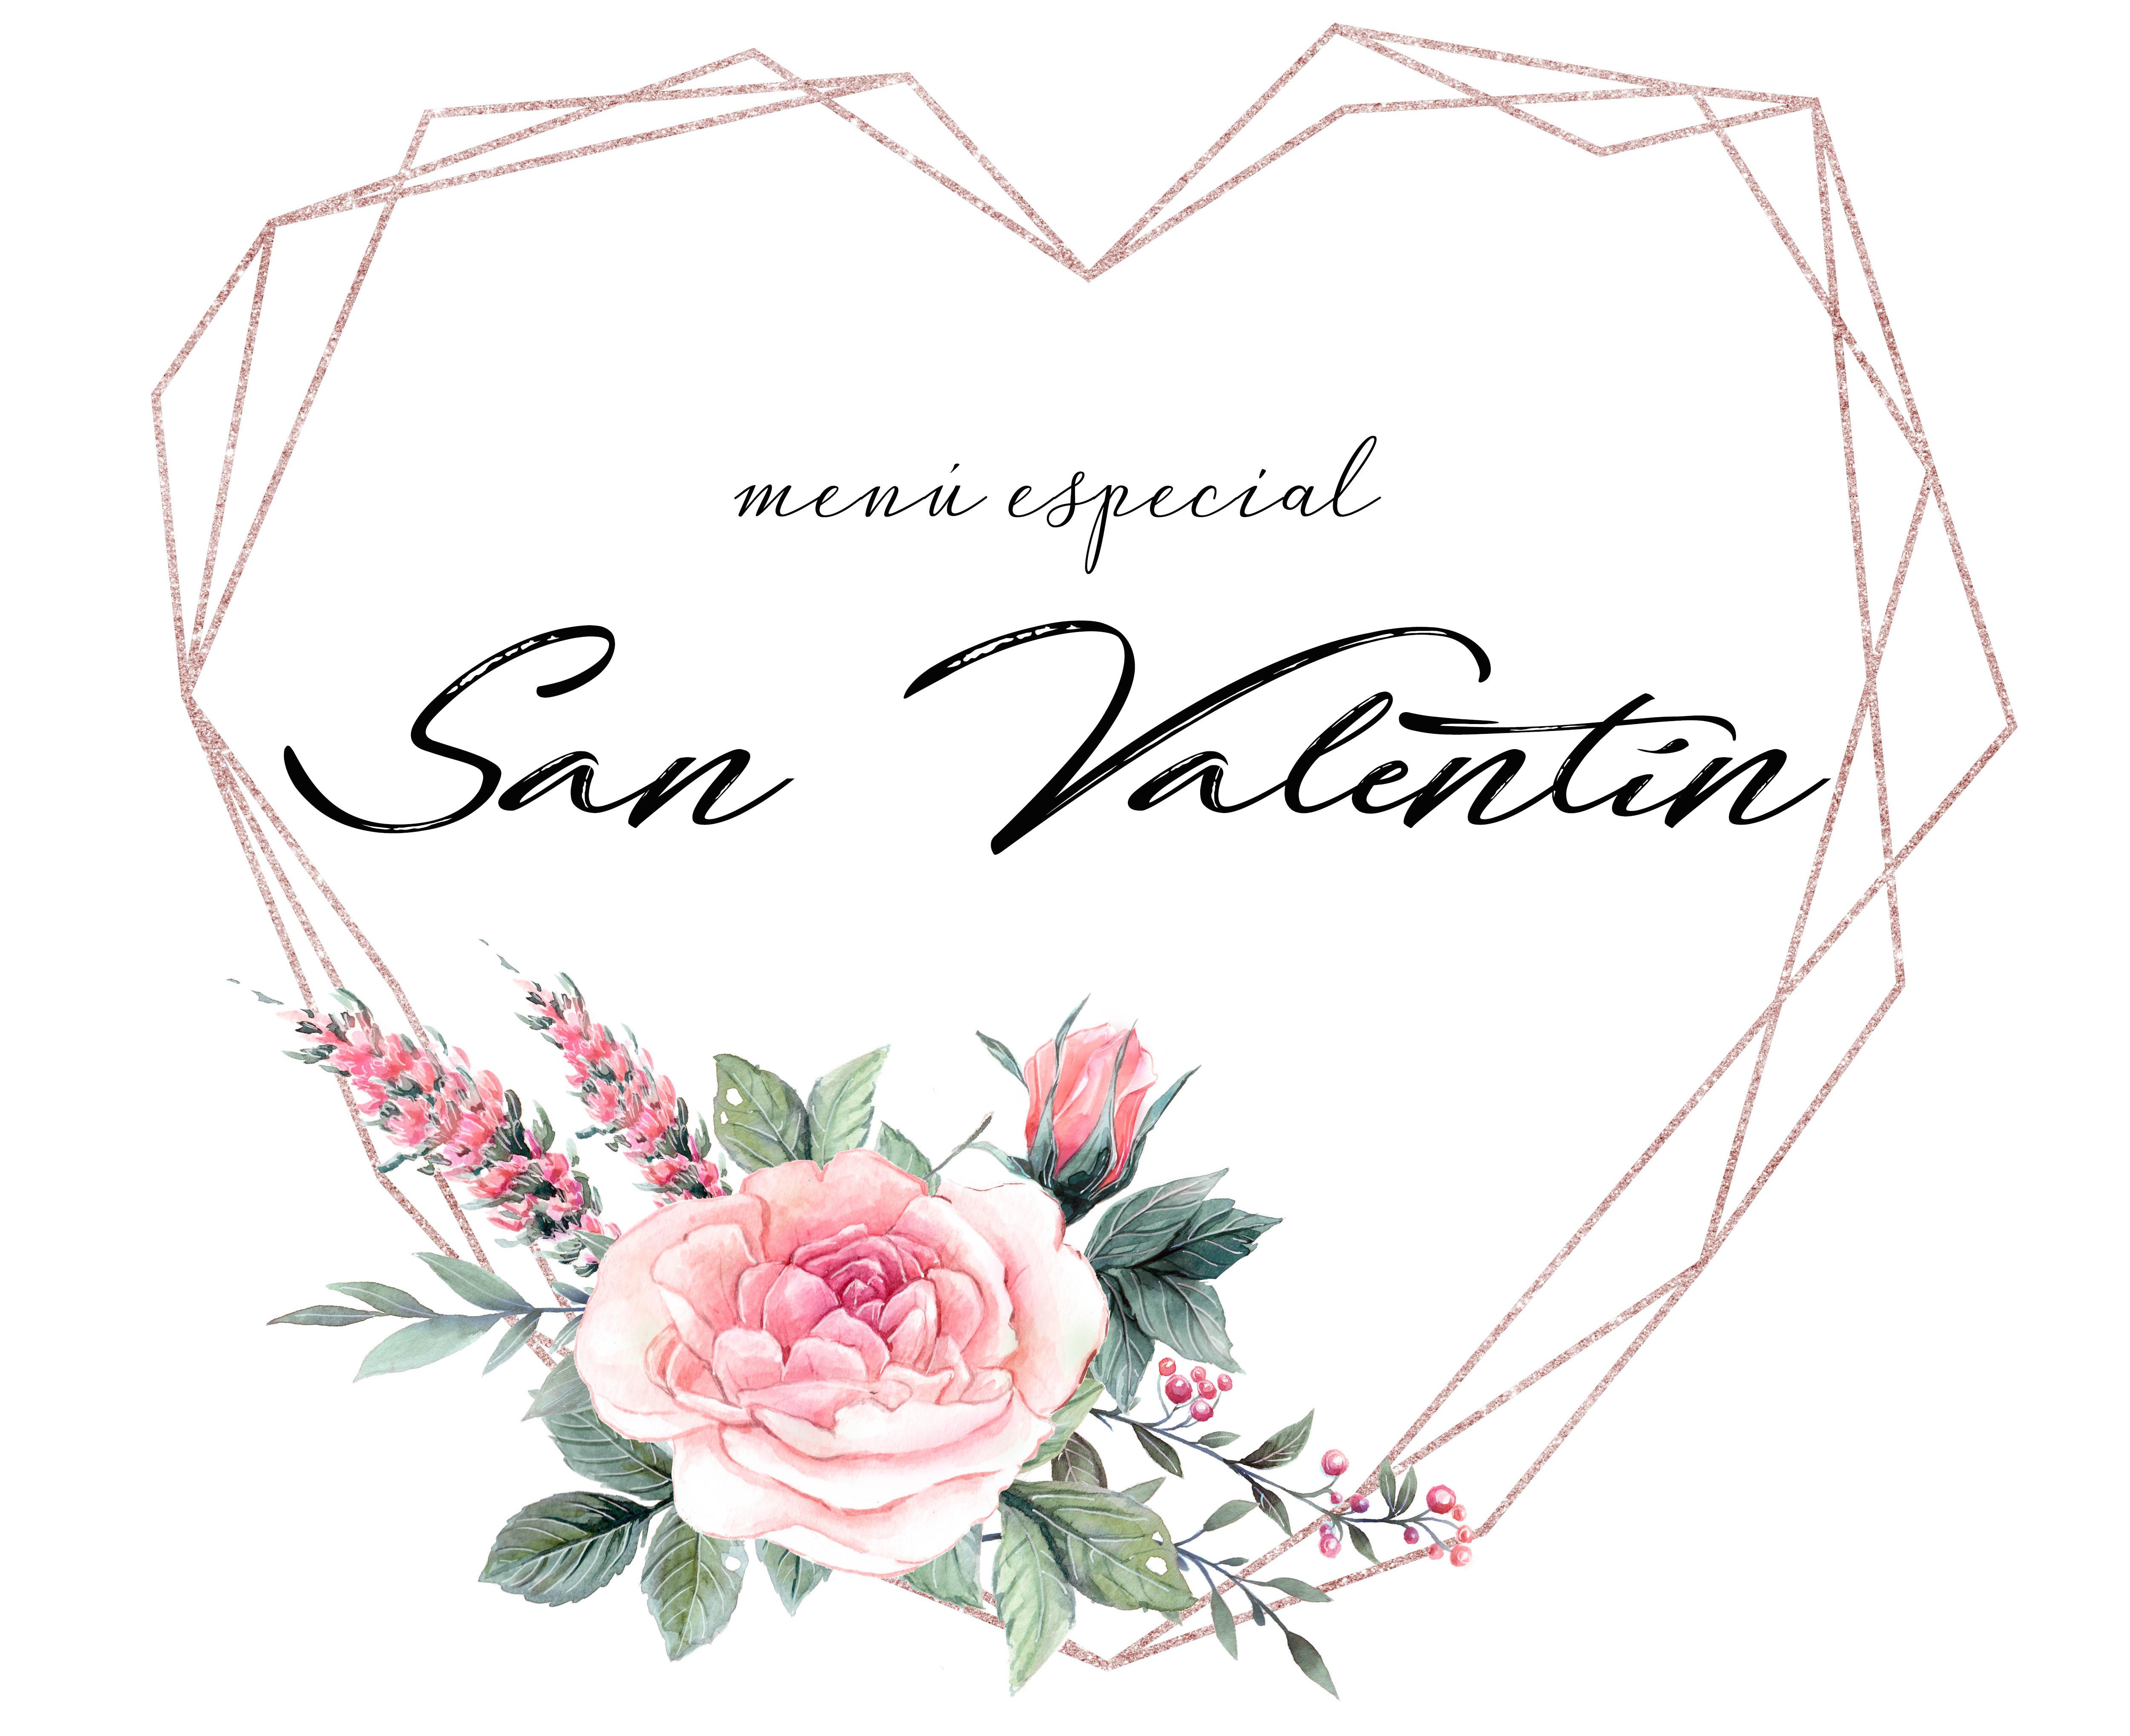 Menú especial San Valentín Casa Cesilia 2019